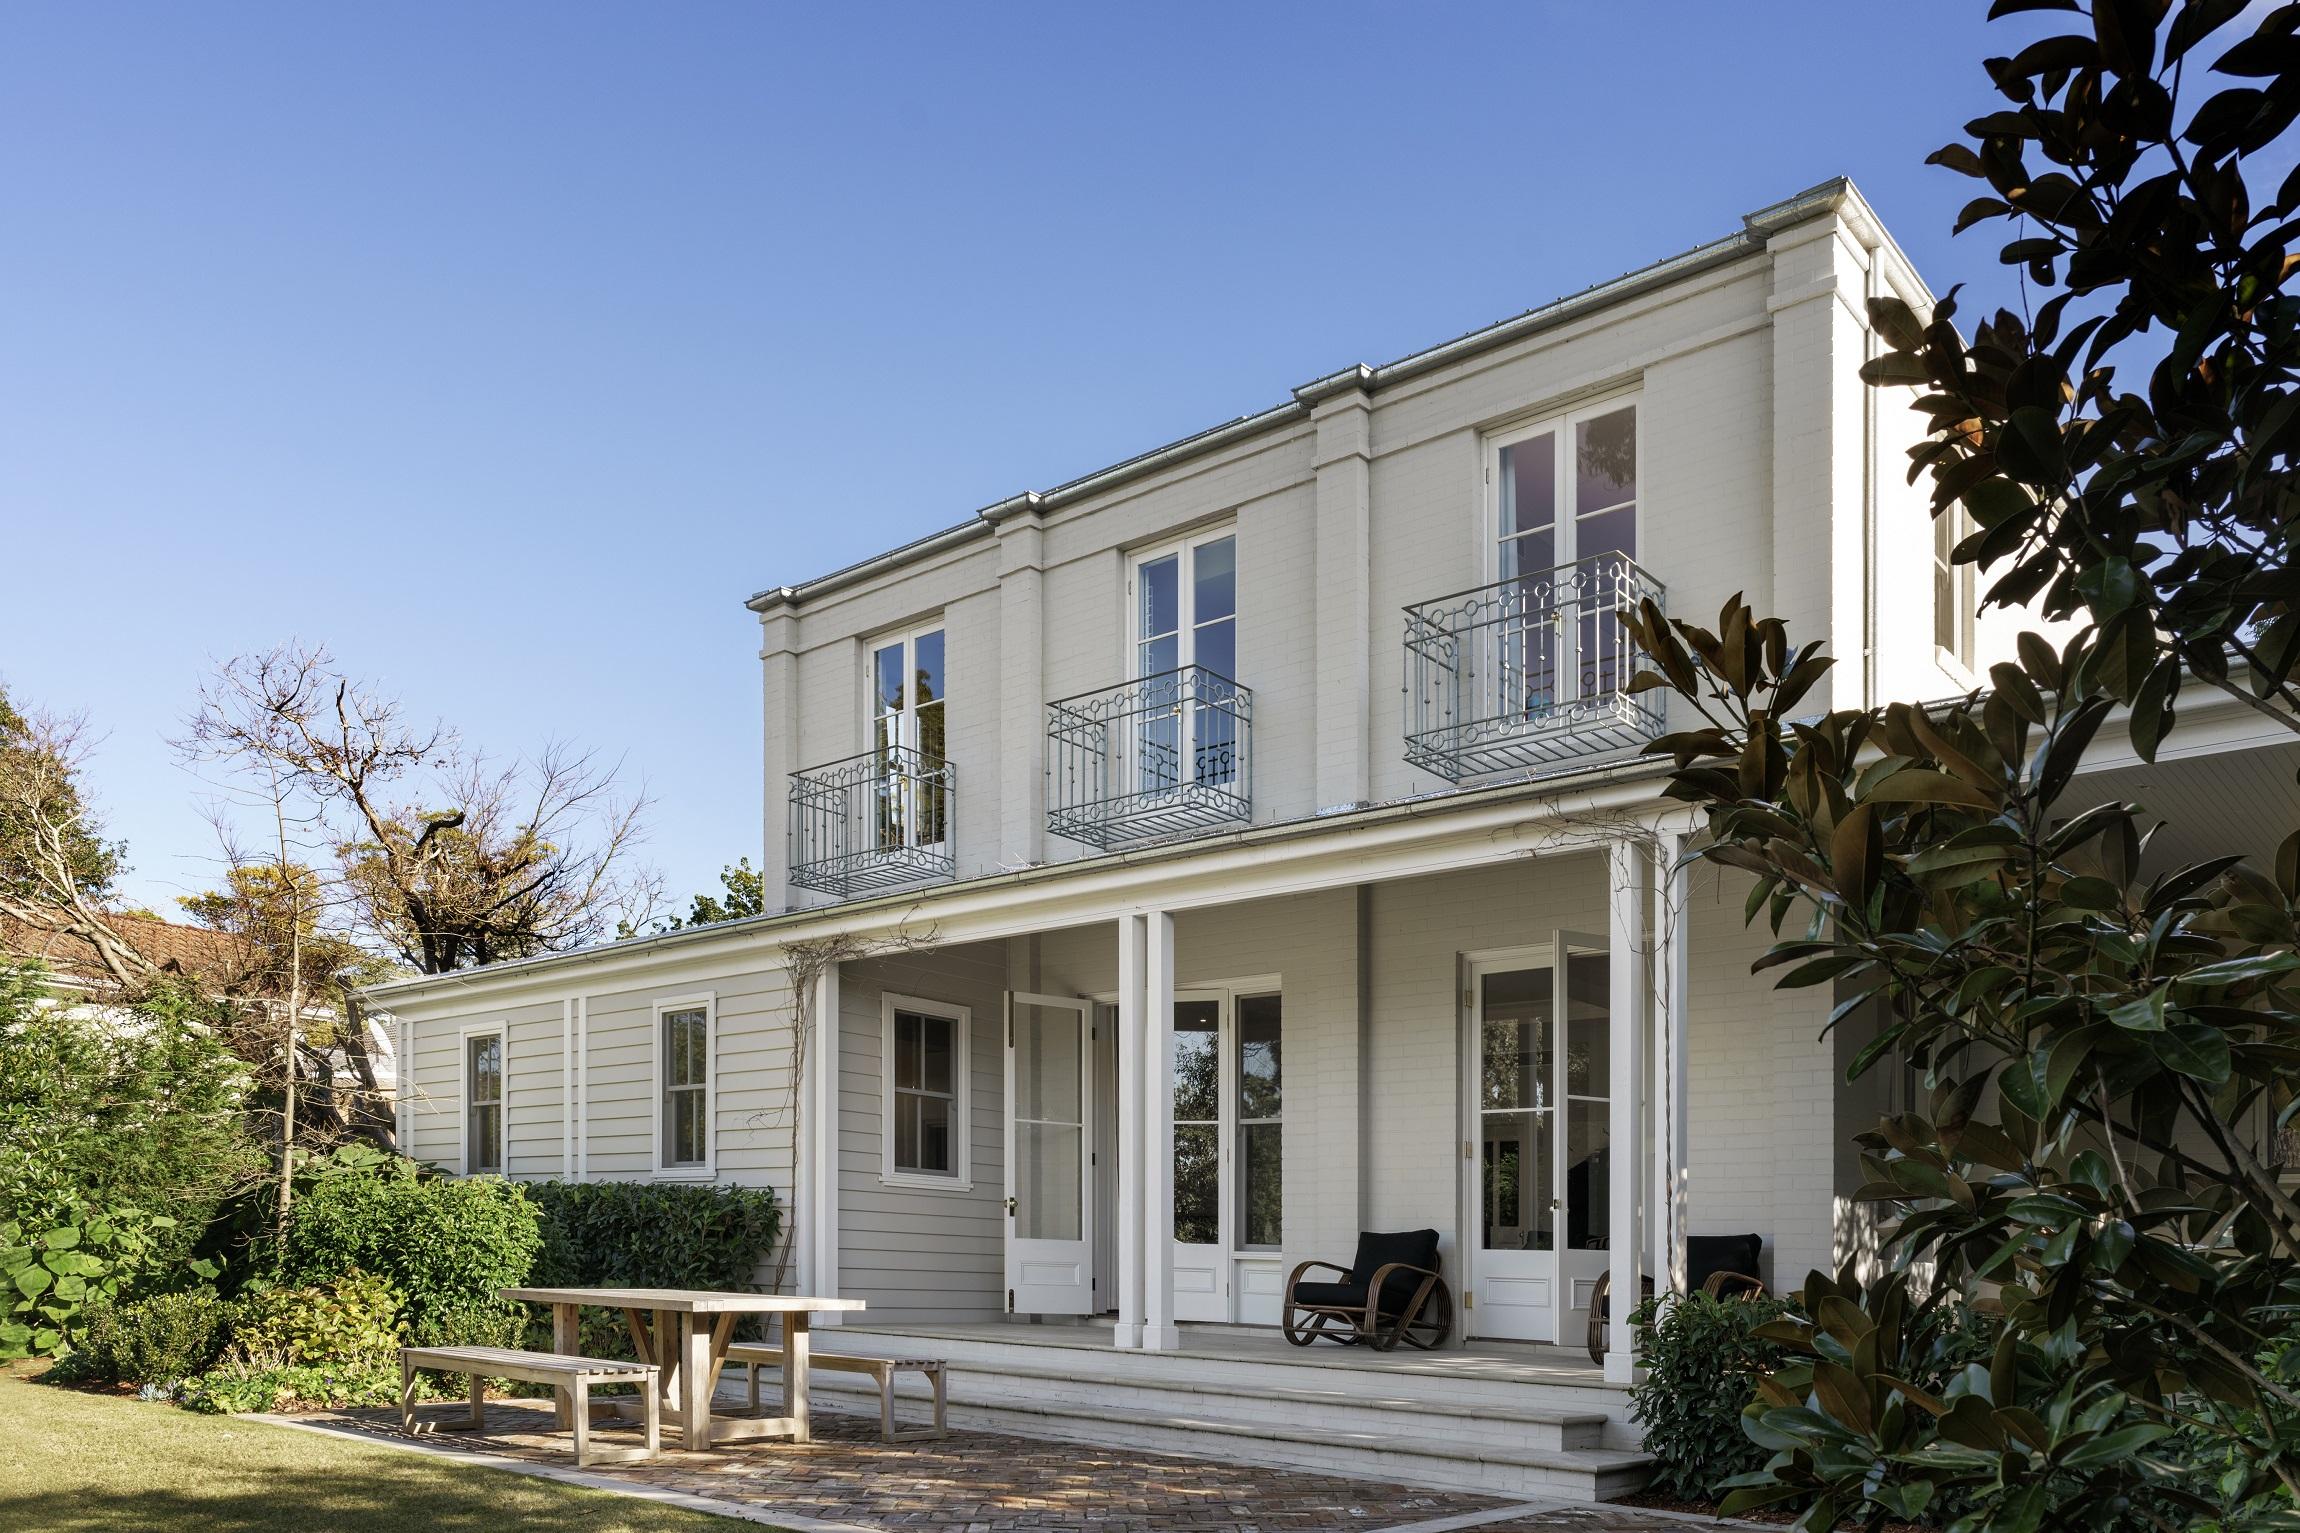 100-Year-Old-Heritage-Home-Restoration-Verandah-Michael-Bell-Architects-Sydney